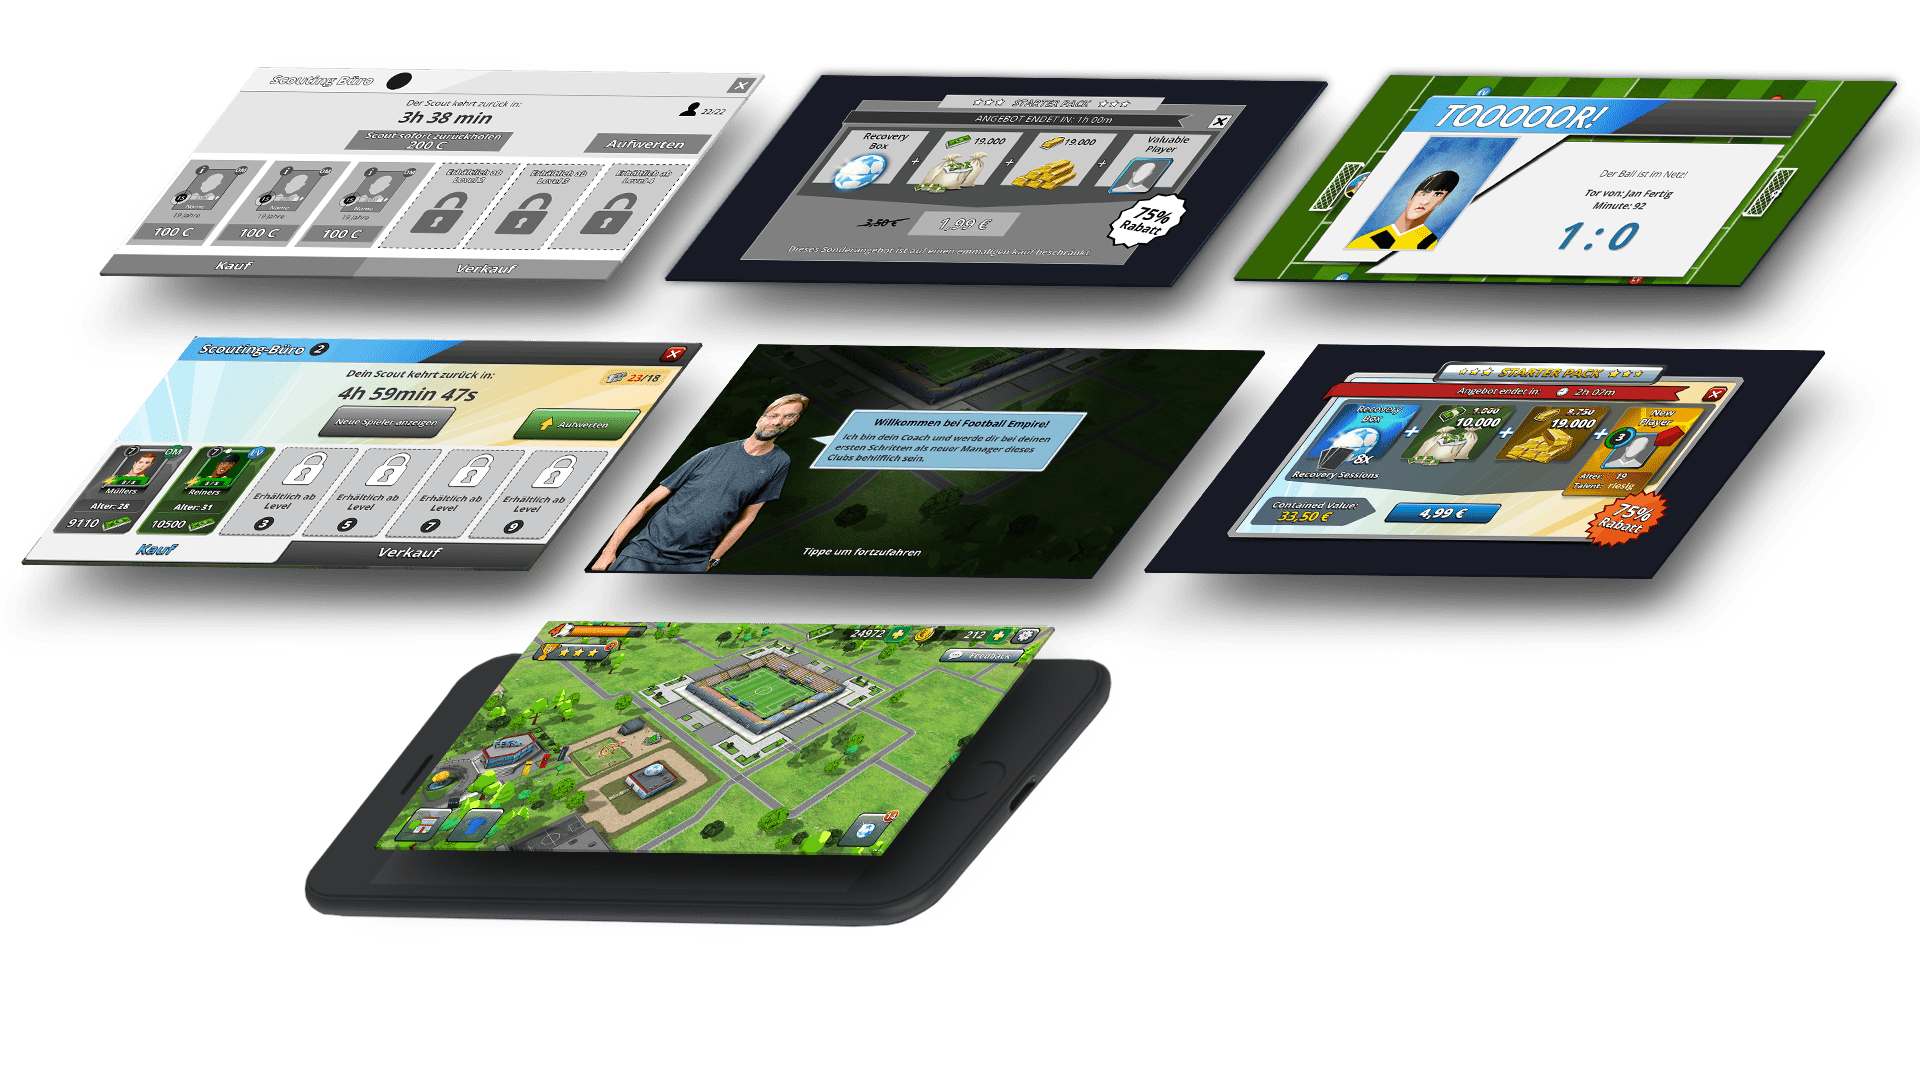 Football Empire Mobile screens